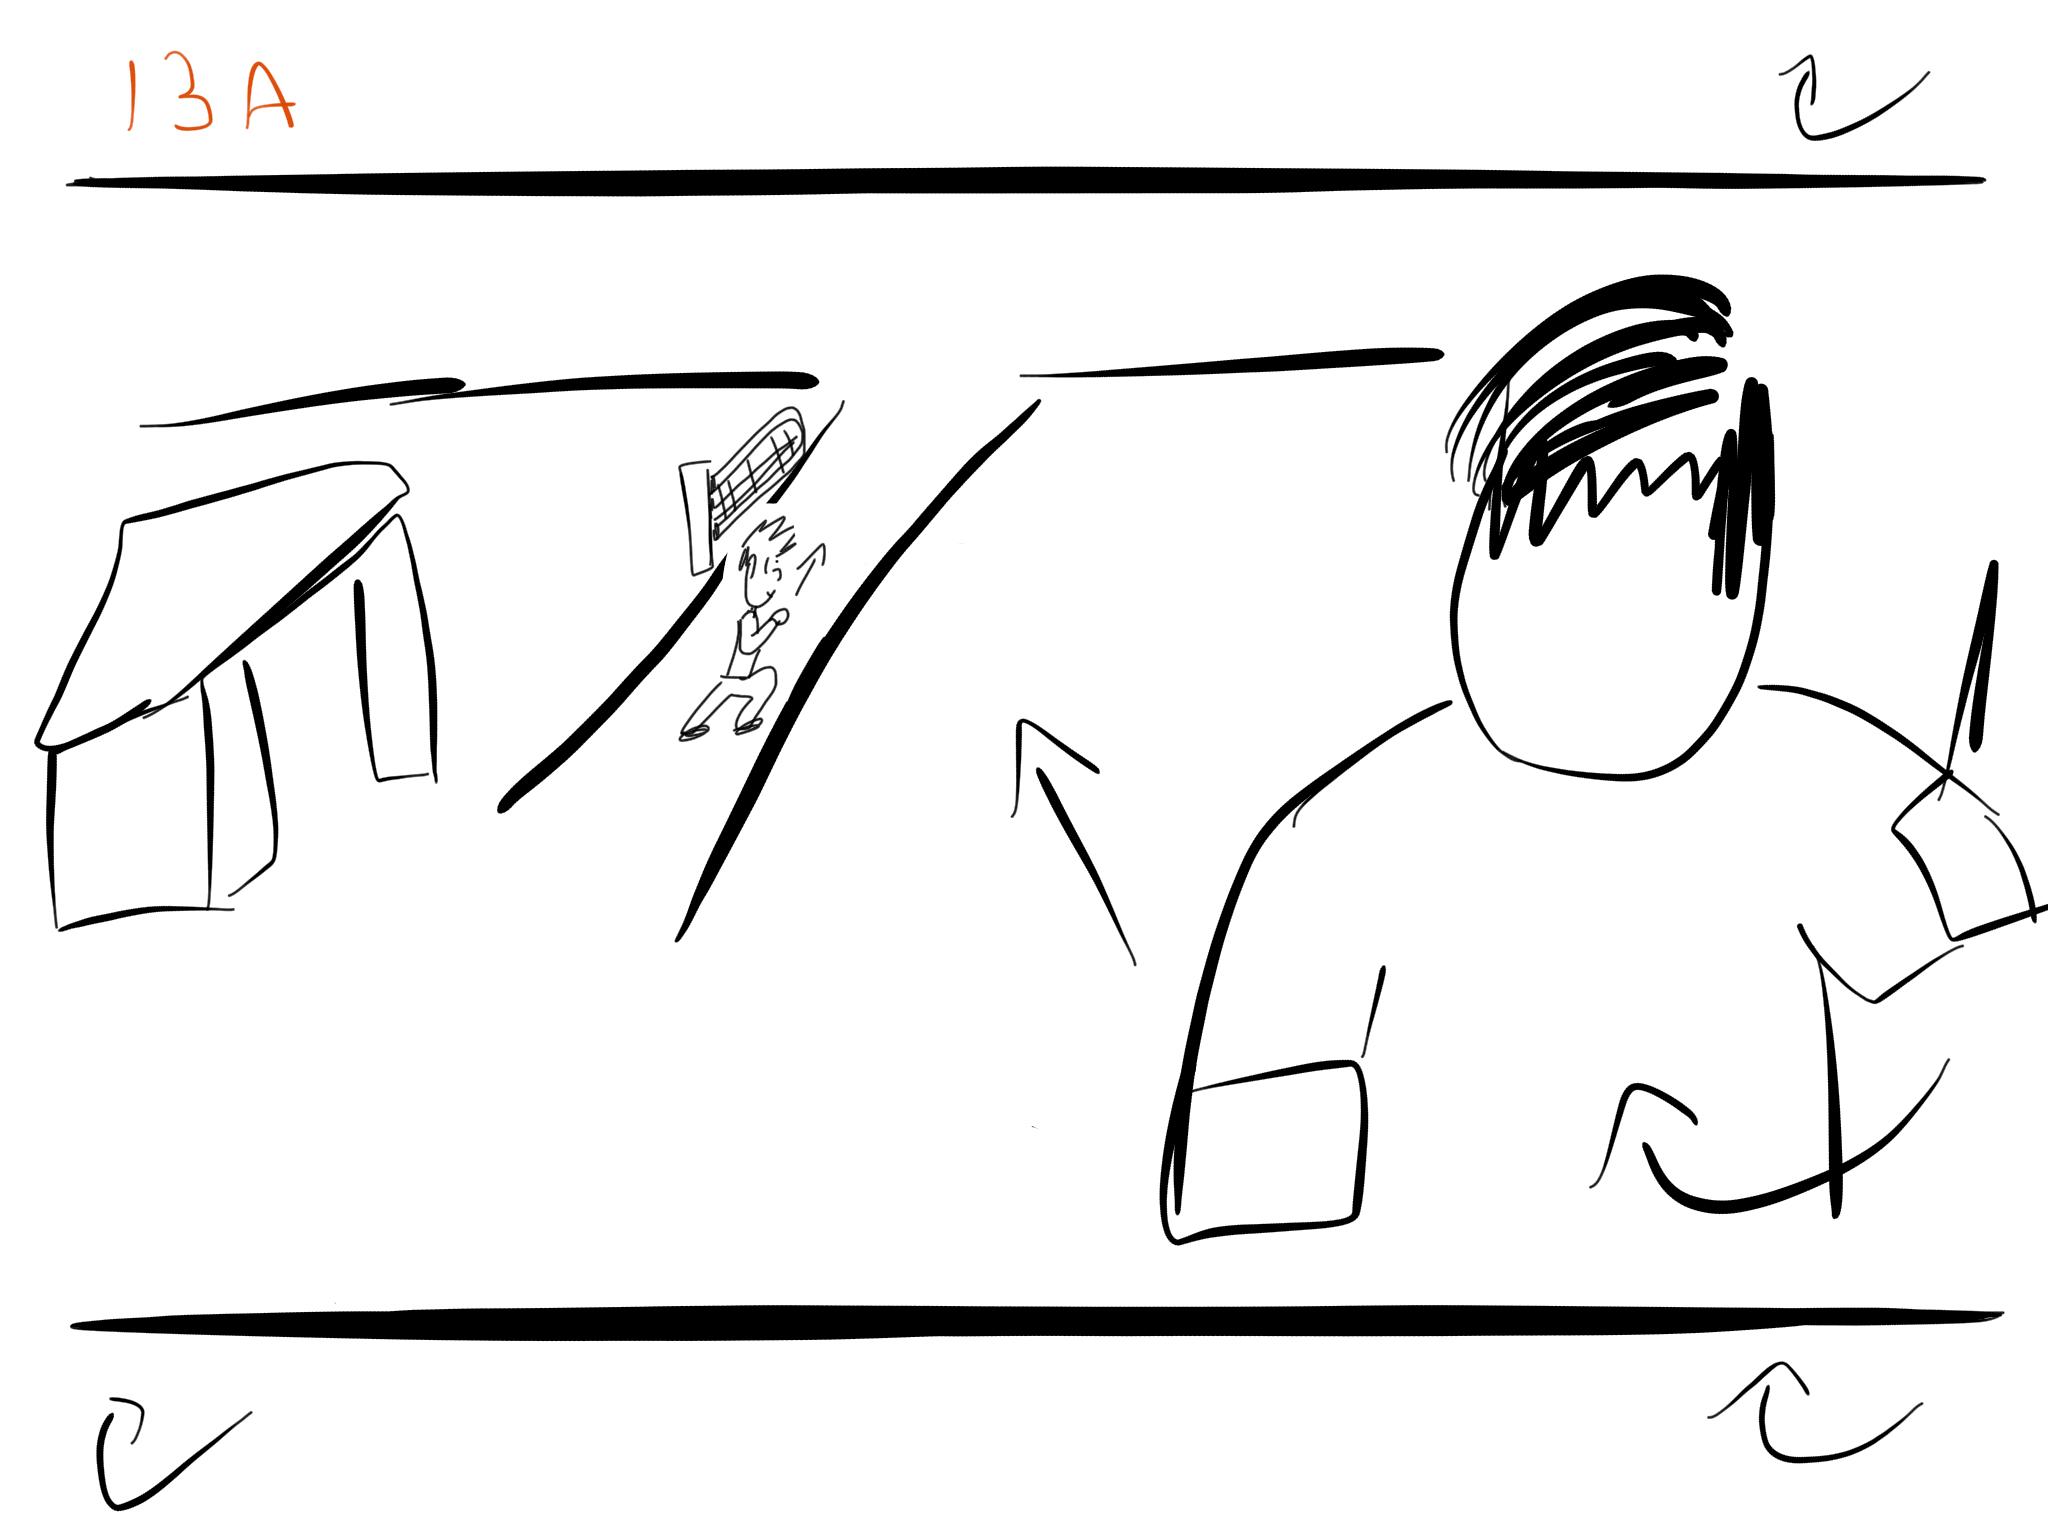 BDF_Storyboards_50.jpg